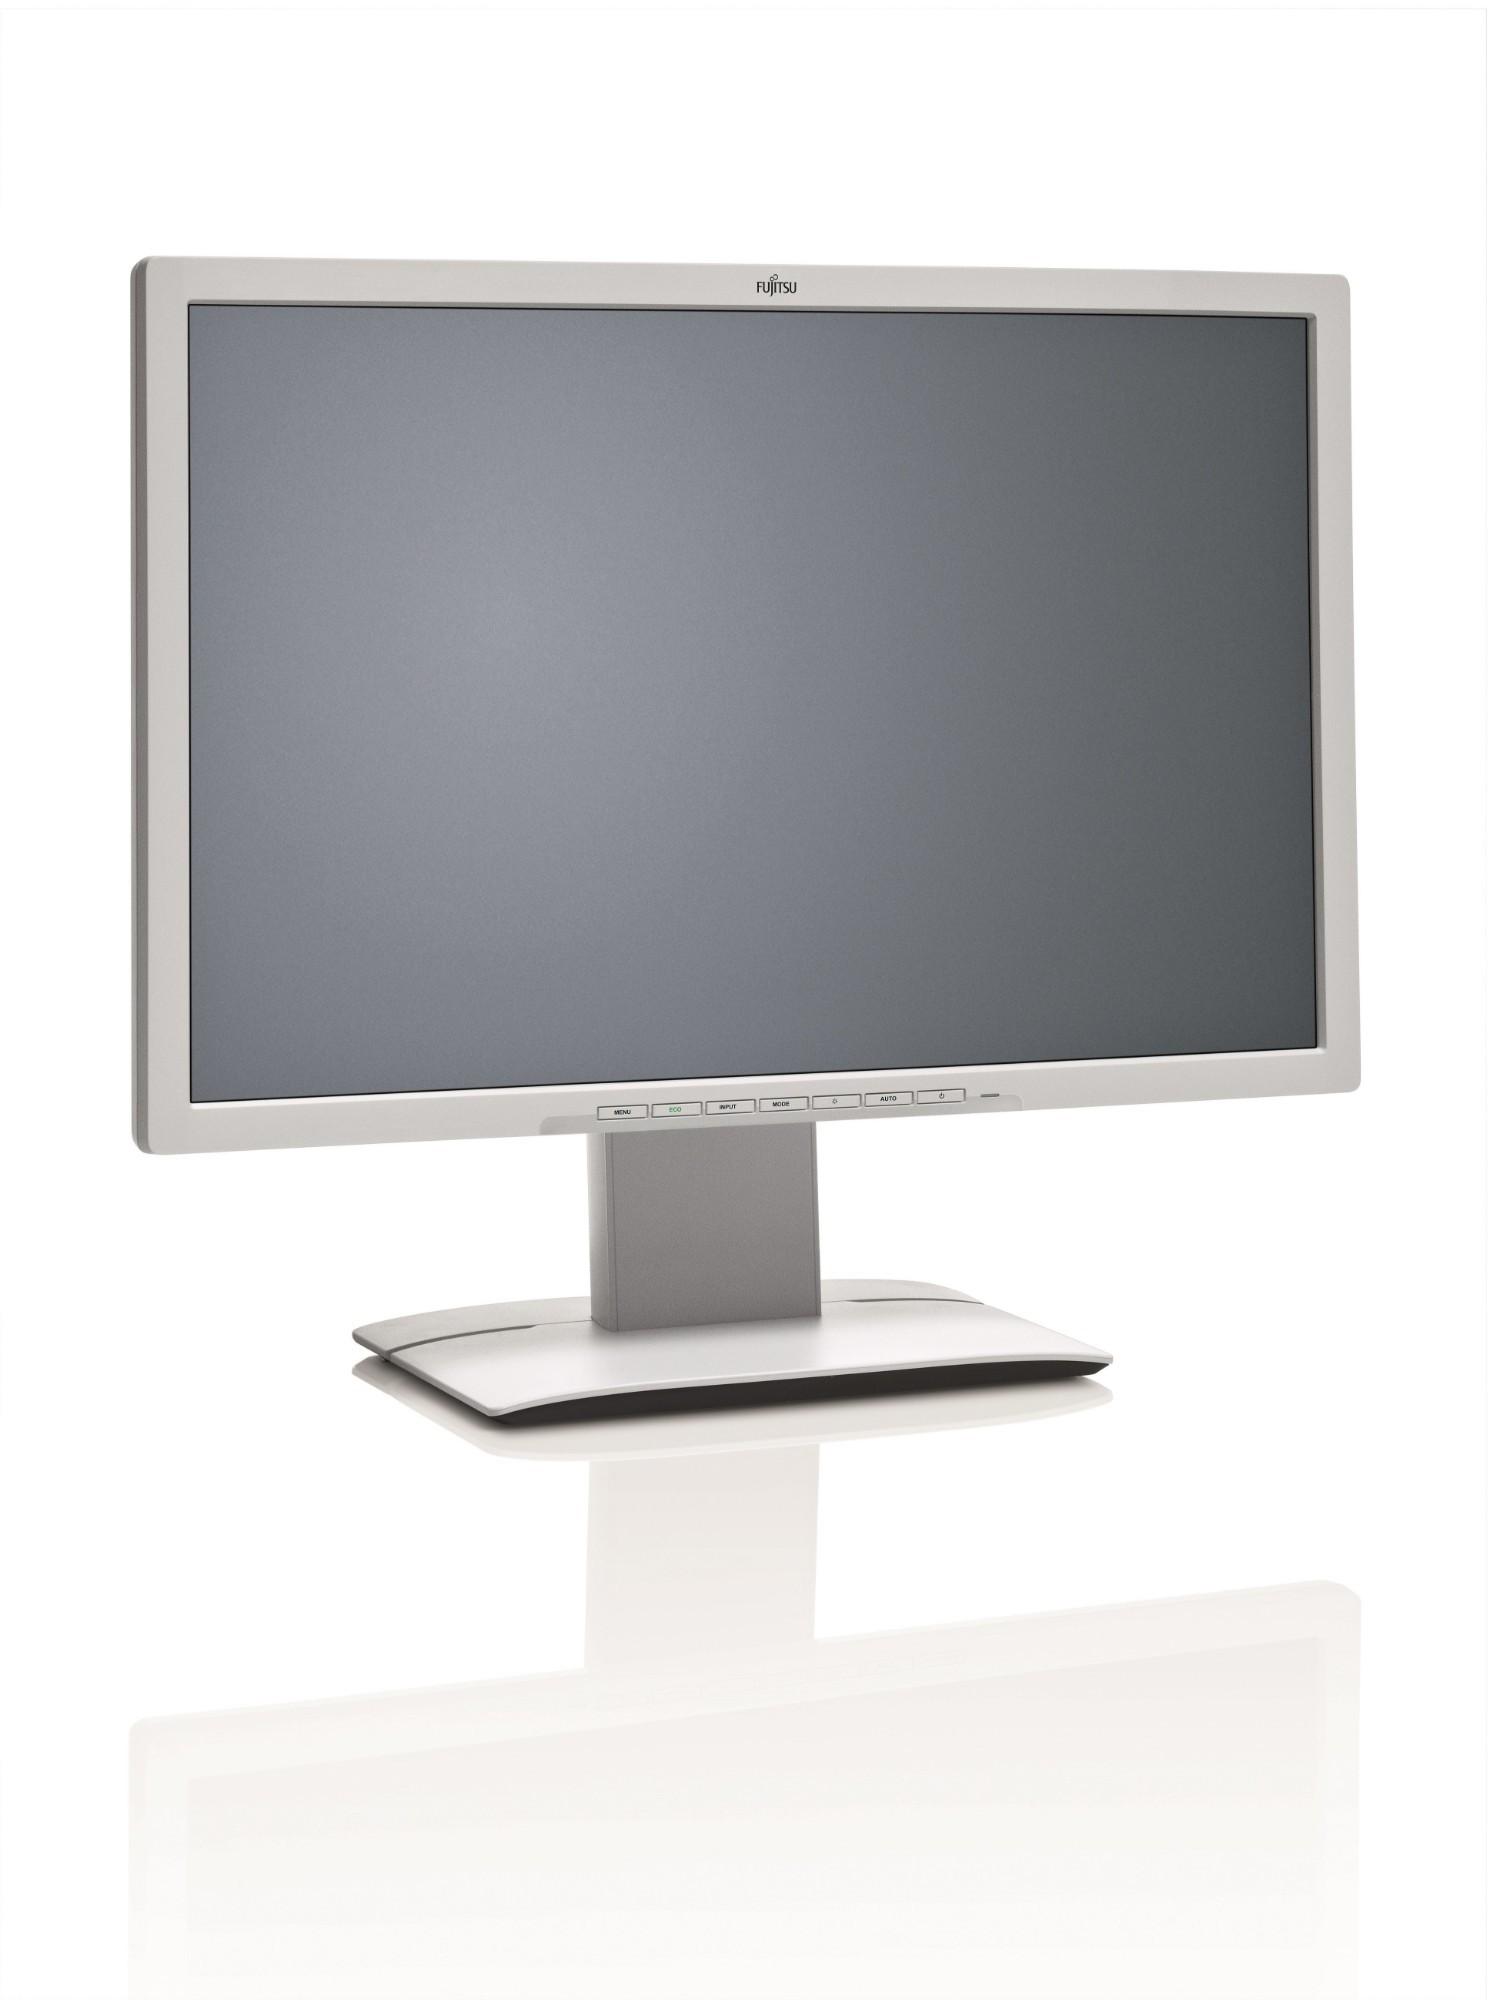 "Fujitsu Ctm5020 Monitor Schematics Diagrams Fujitsu B Line B24w 6 Led Display 61 Cm 24"" 1920 X 1200 Pixels Full Hd Matt Grey 0 In Of Fujitsu Ctm5020 Monitor Schematics Diagrams"